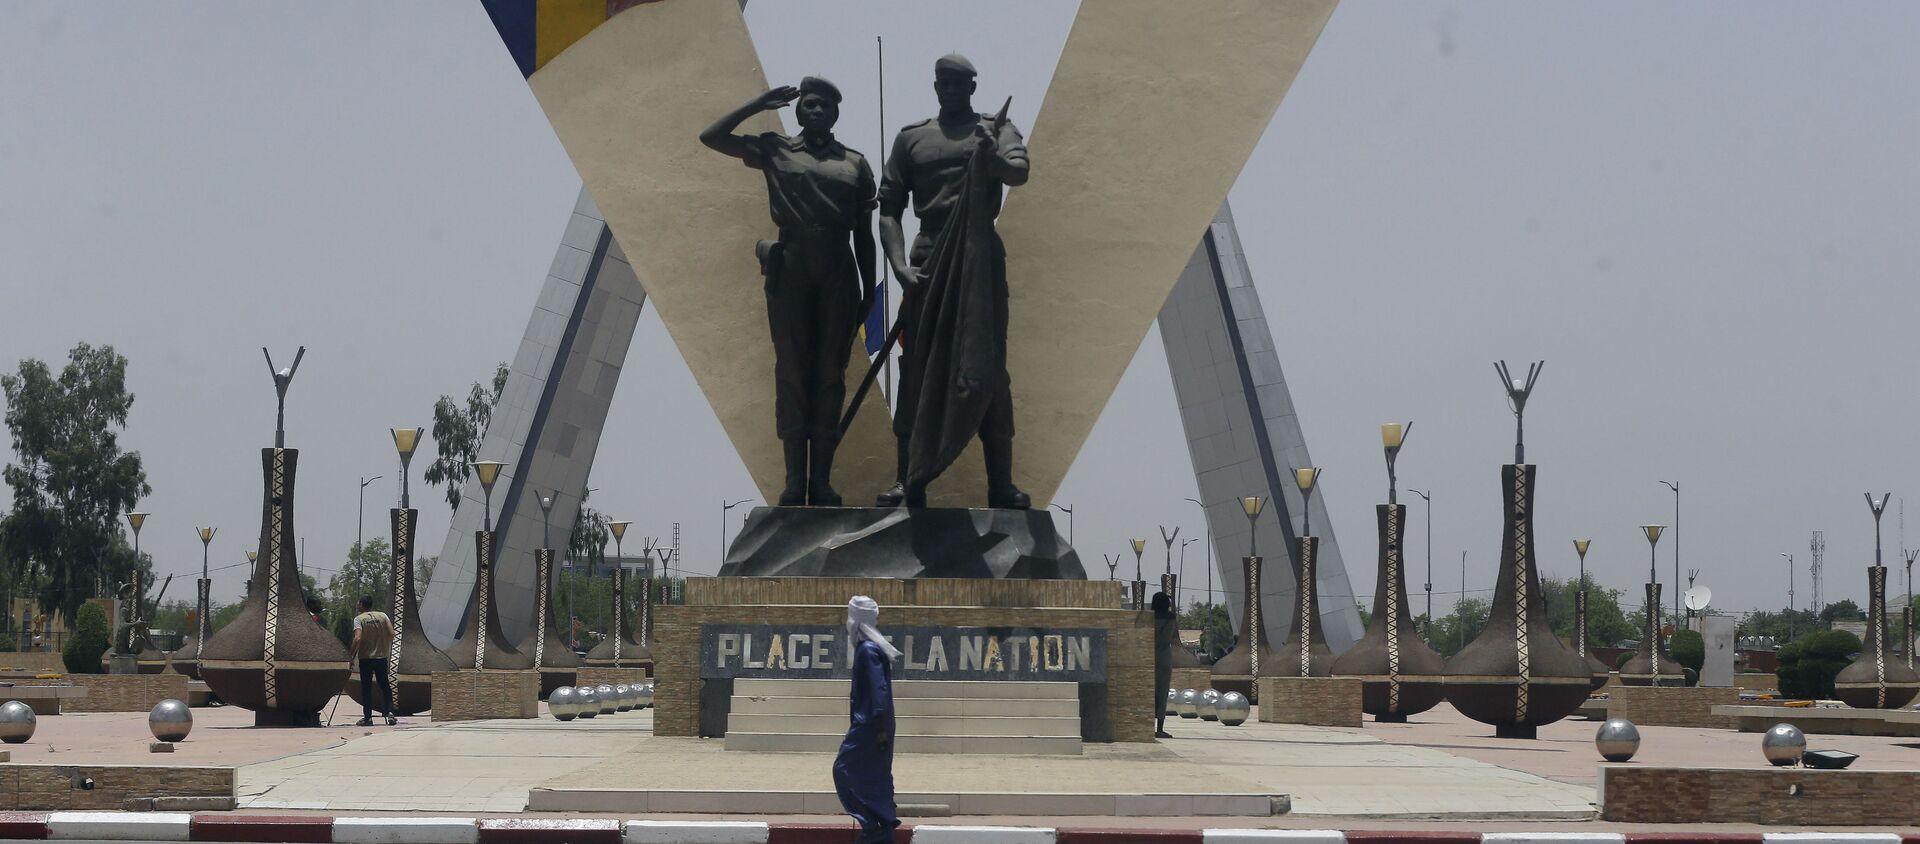 Place de la nation de N'djamena - Sputnik France, 1920, 04.05.2021